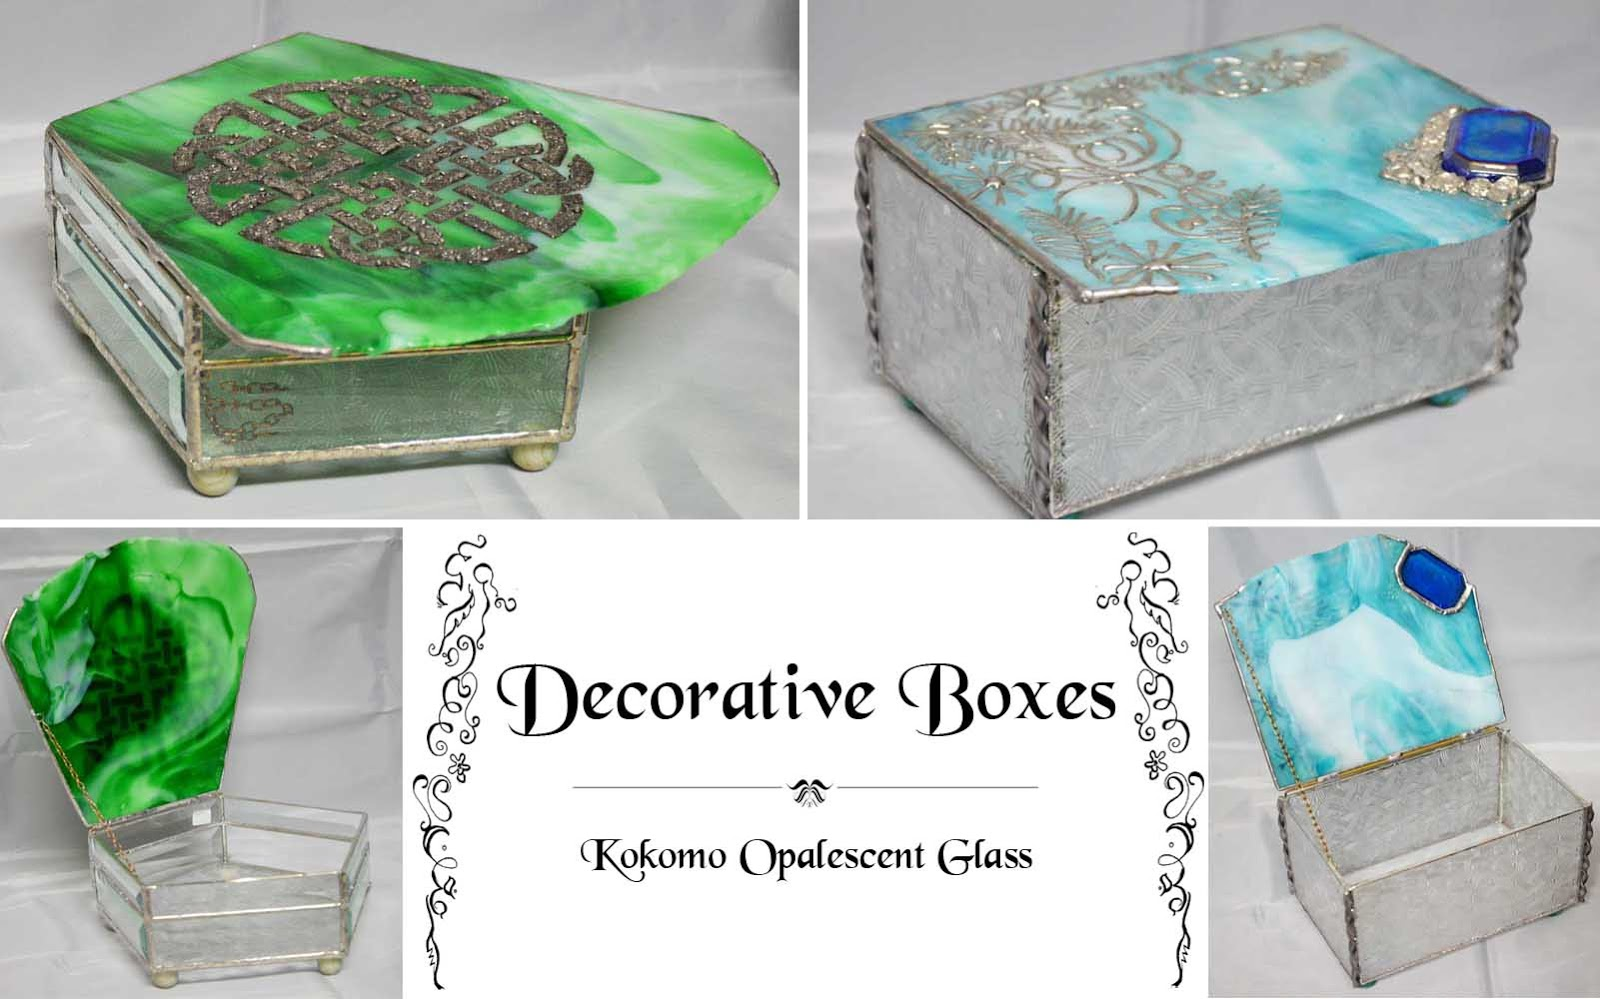 Decorative boxes kokomo opalescent glass kog - Decorative storage boxes ...